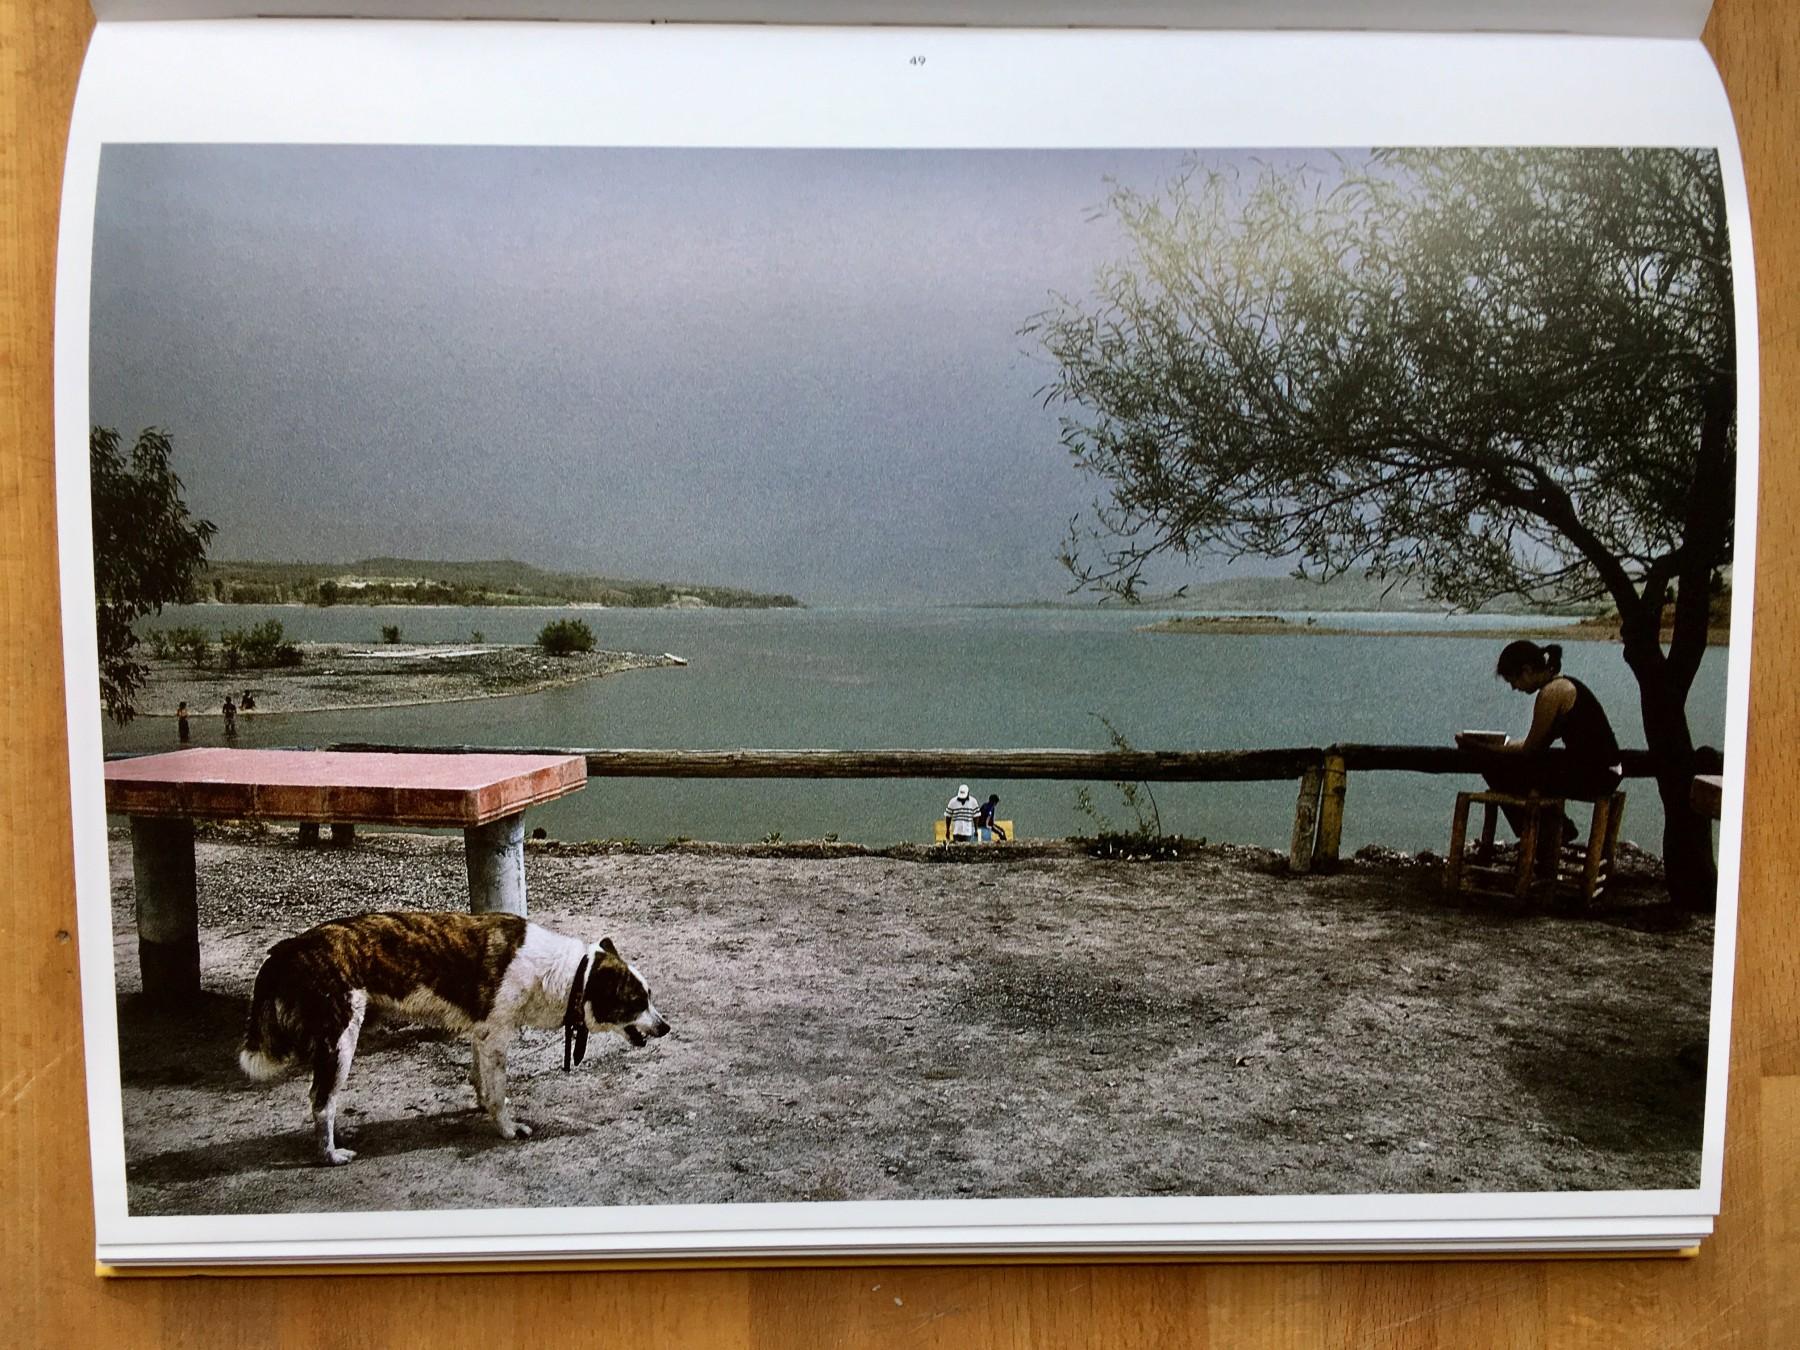 enster-blog-di-cultura-fotografica-harry-gruyaert-rivage-108.JPG